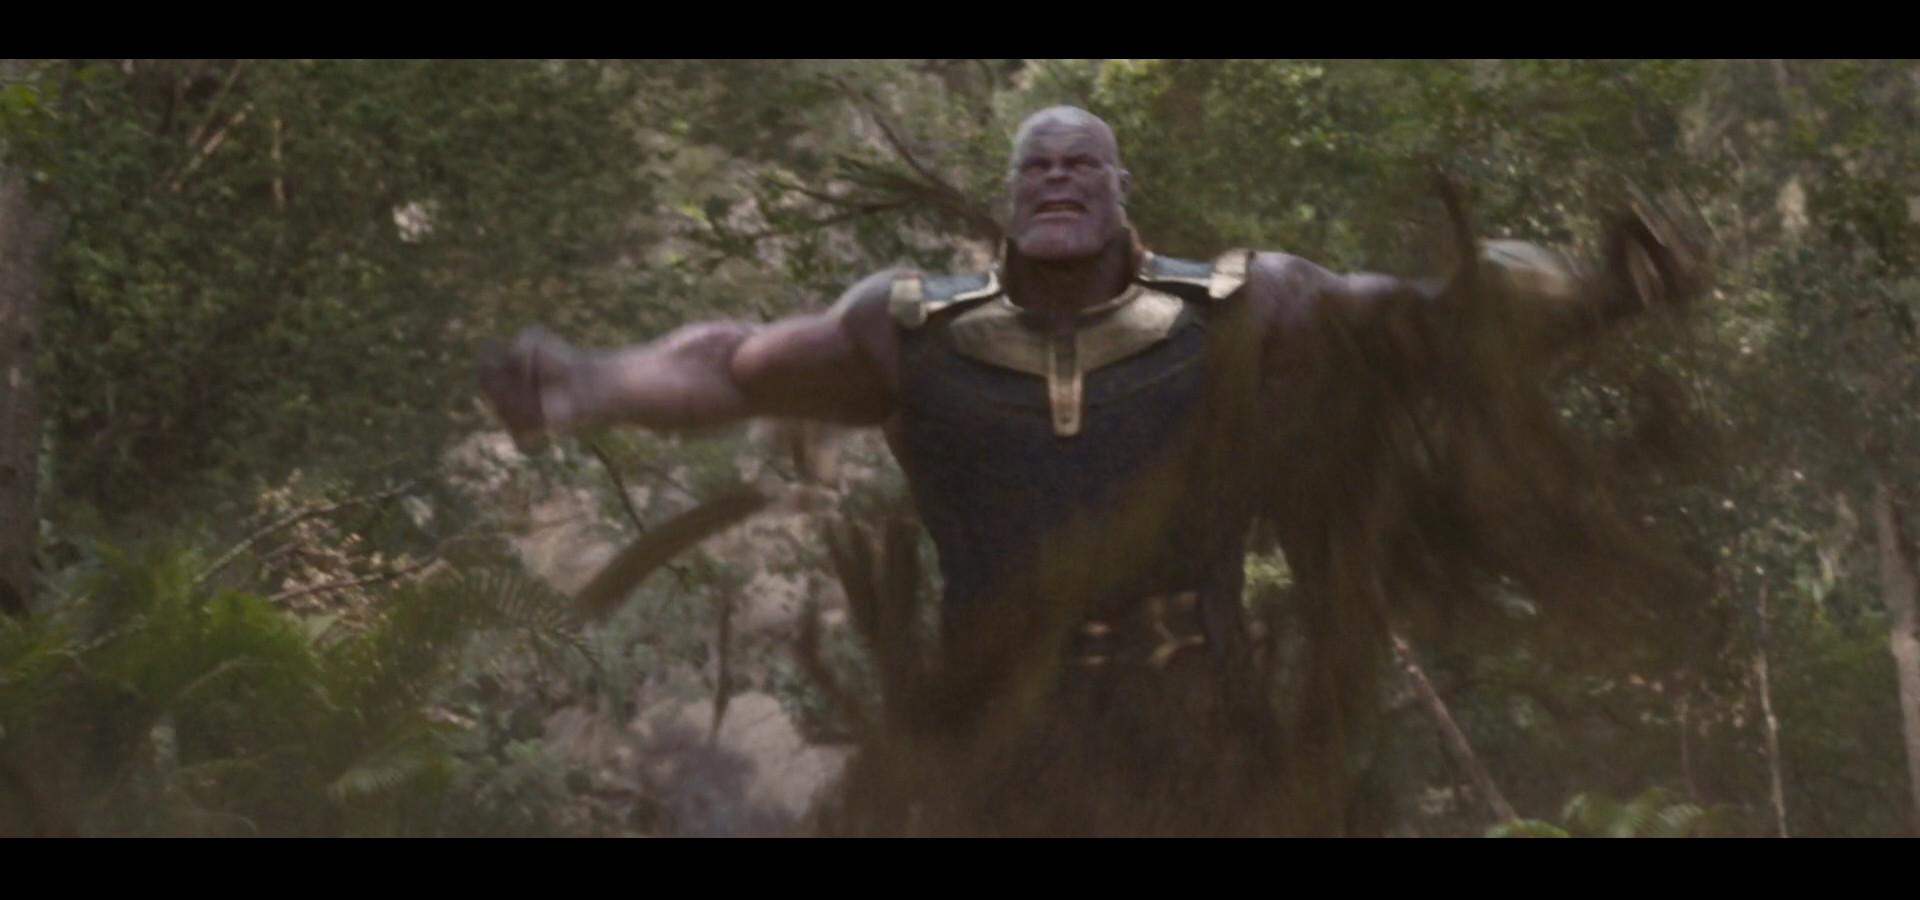 Scott knapp avengers screenshots 017